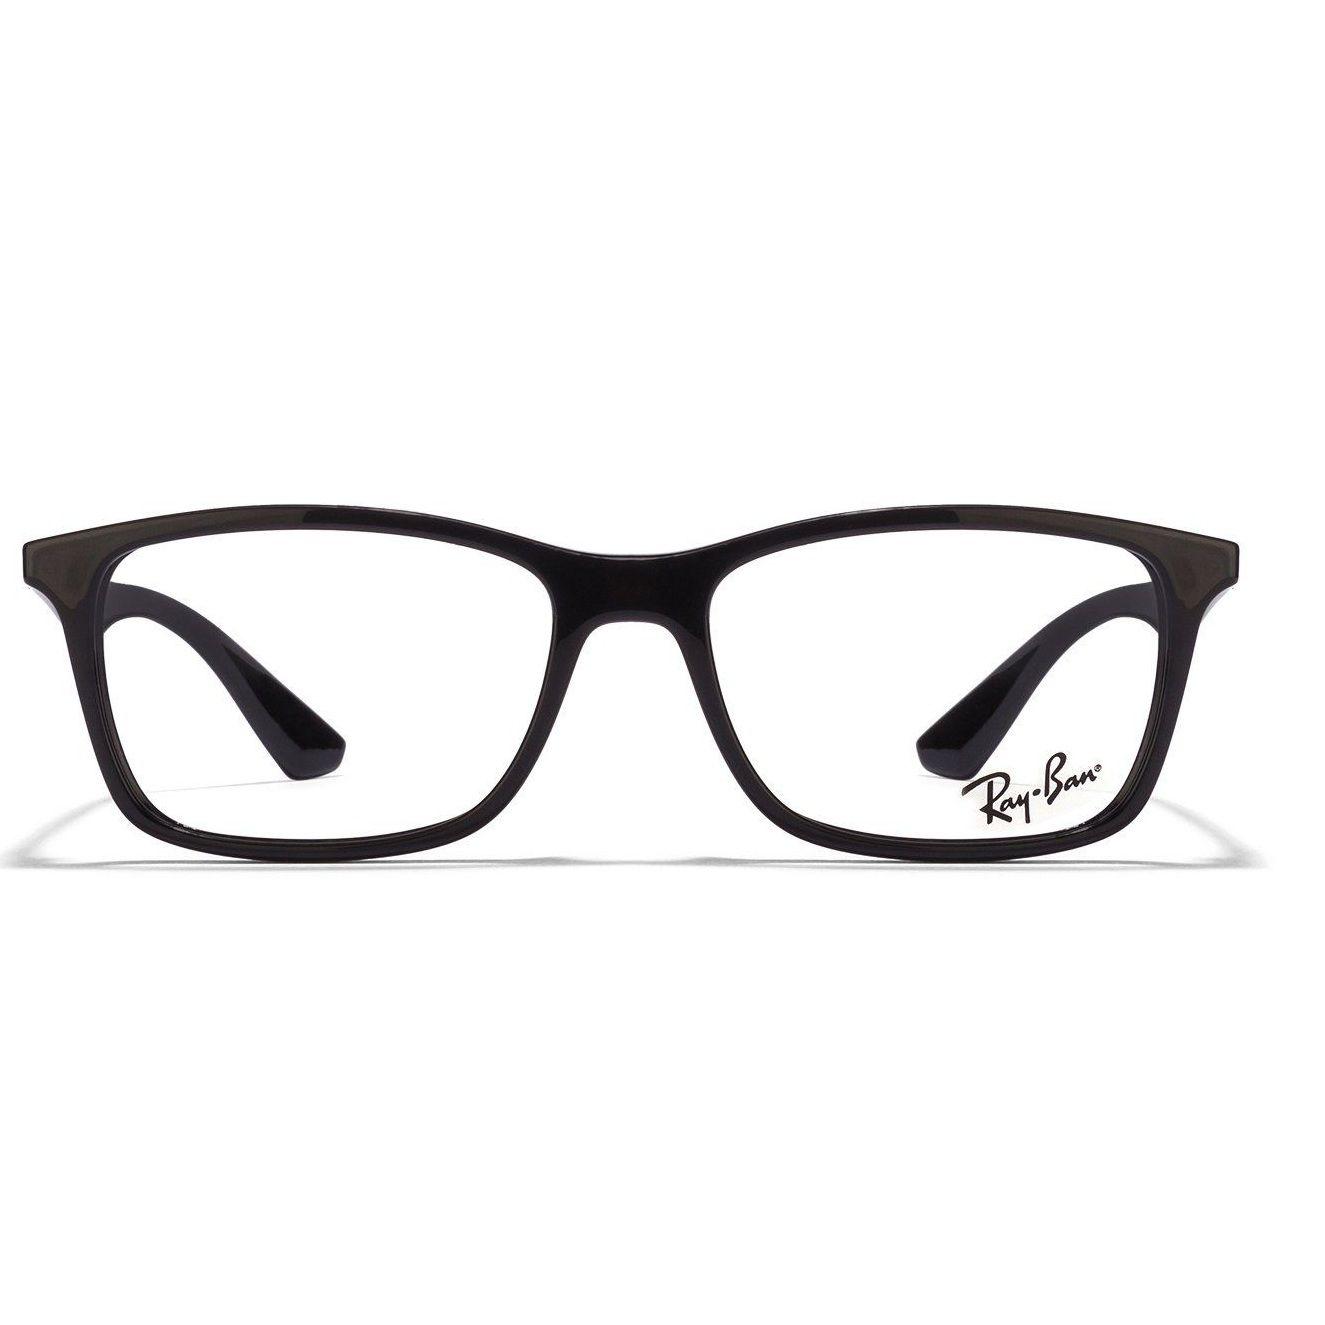 cd11e70681 Ray-Ban RX5228 2000 Black Frame And Temple Unisex Rectangle Eyeglasses   RayBan  Unisex